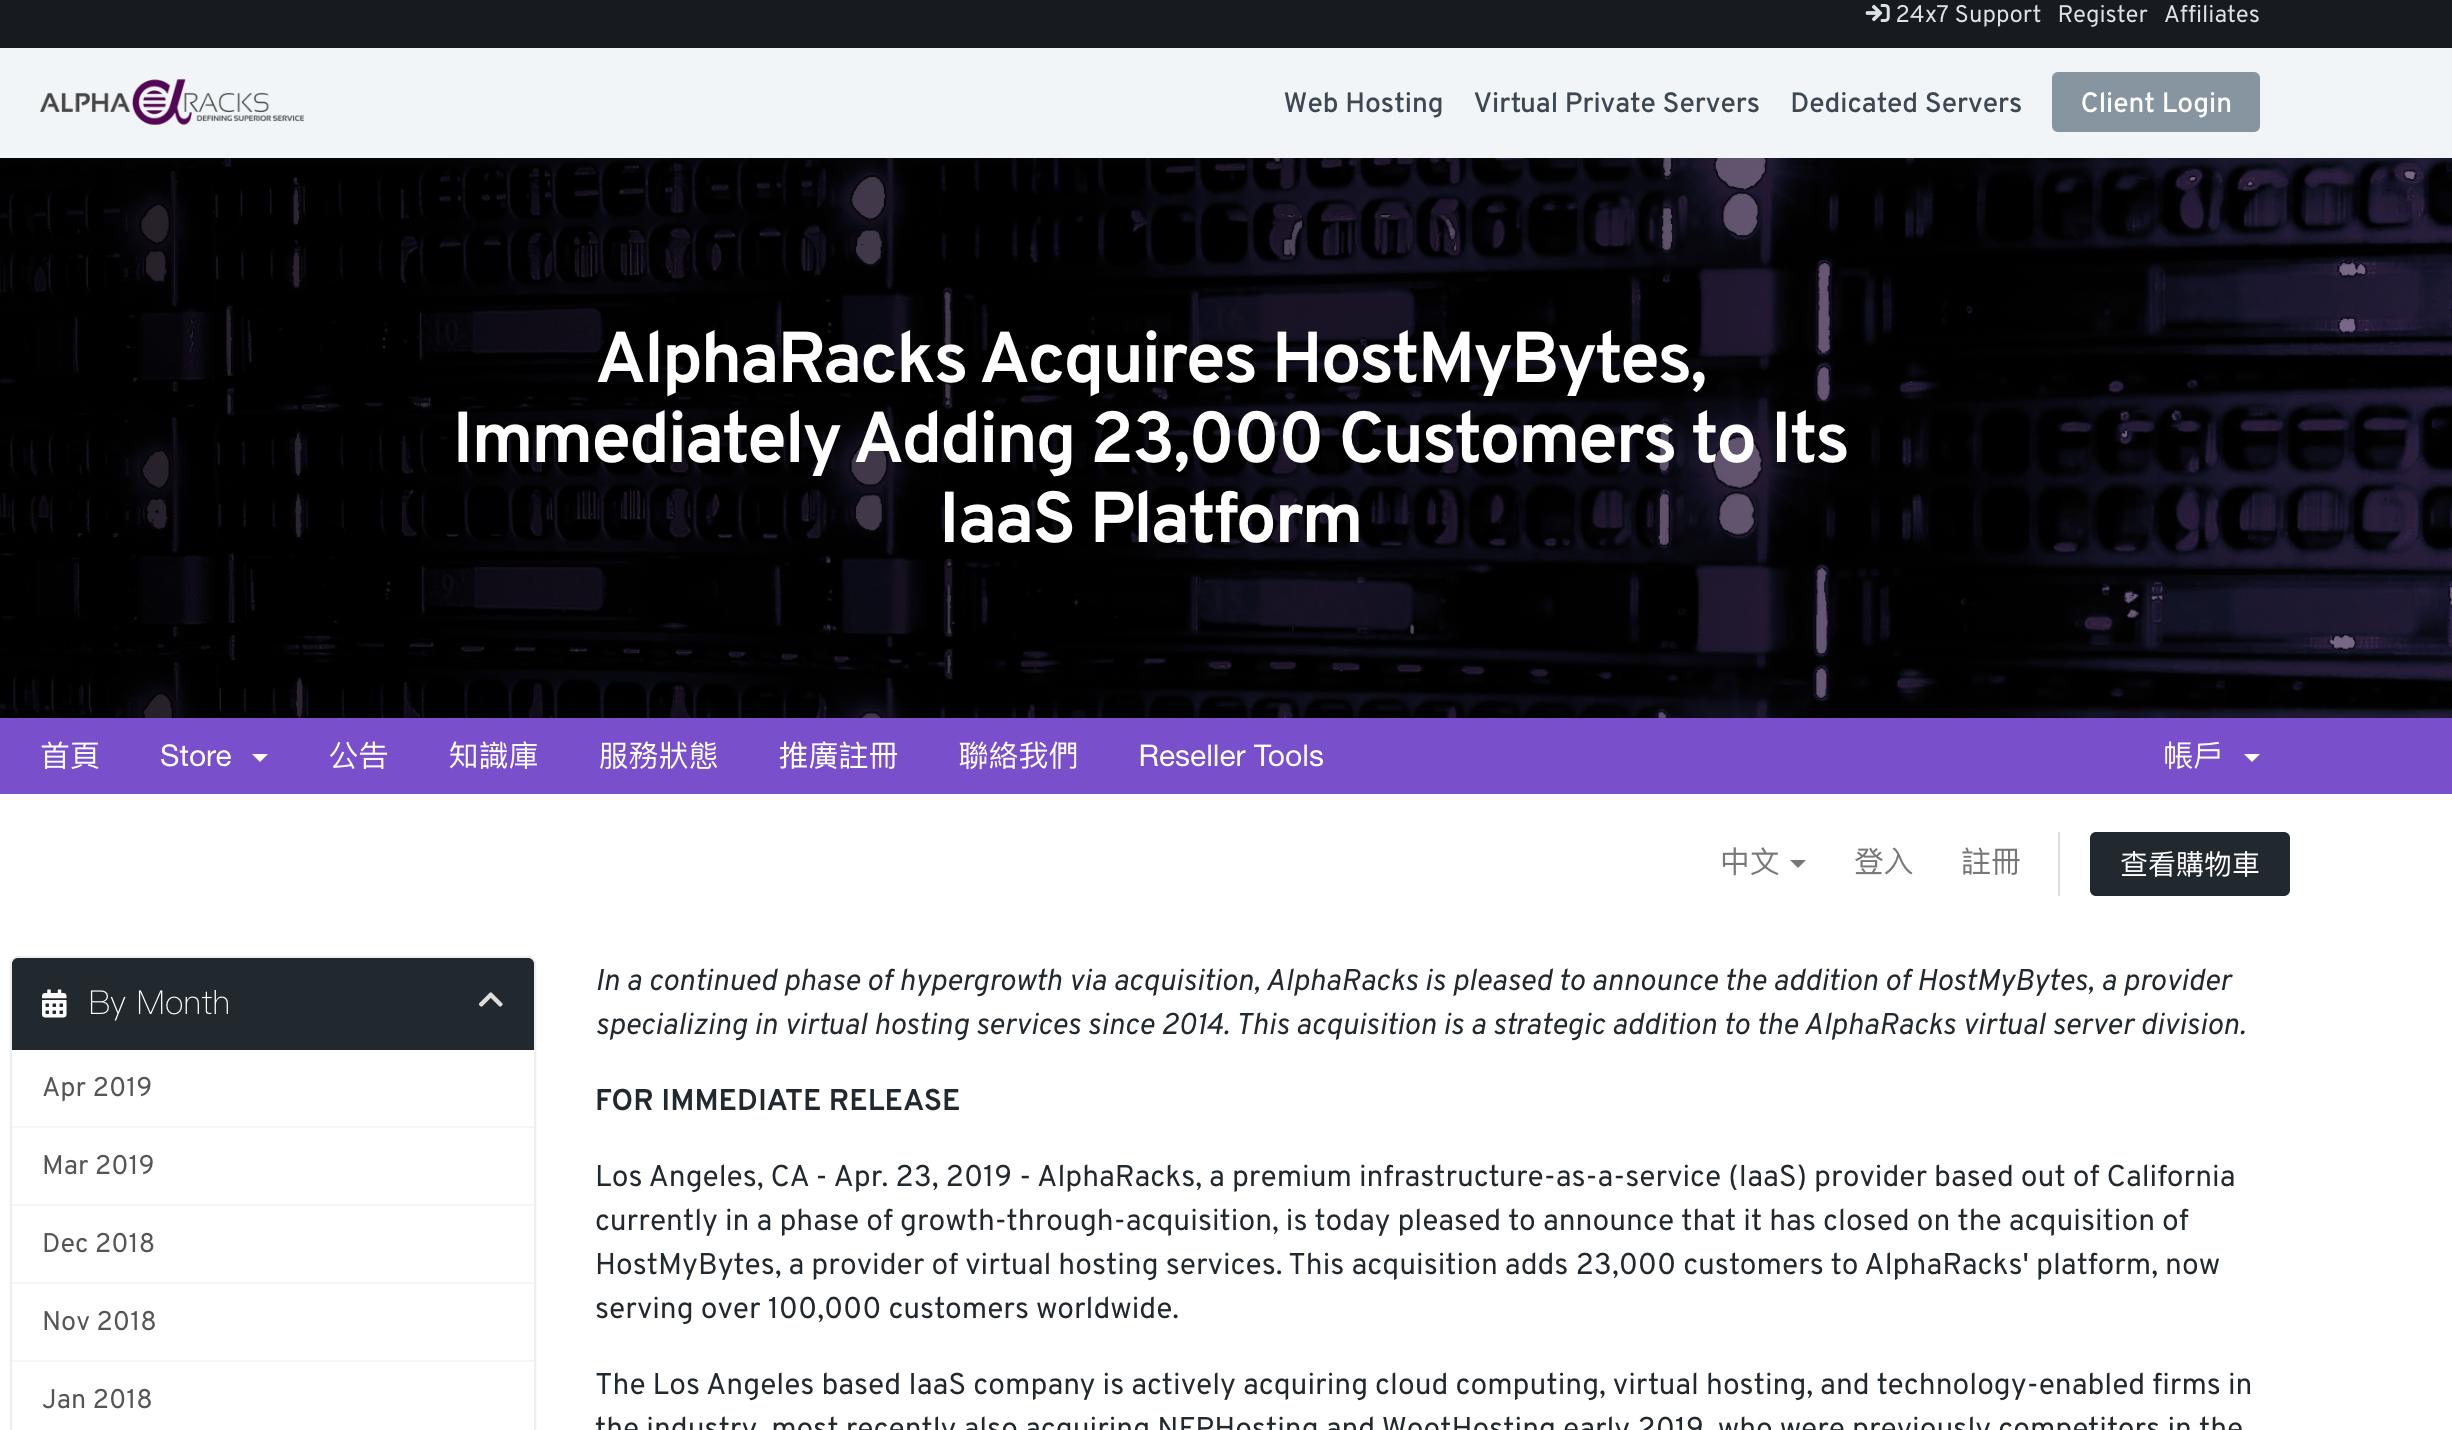 最新商家消息:Hostmybytes被Alpharacks收购了,Hostmybytes直接跳转Alpharacks